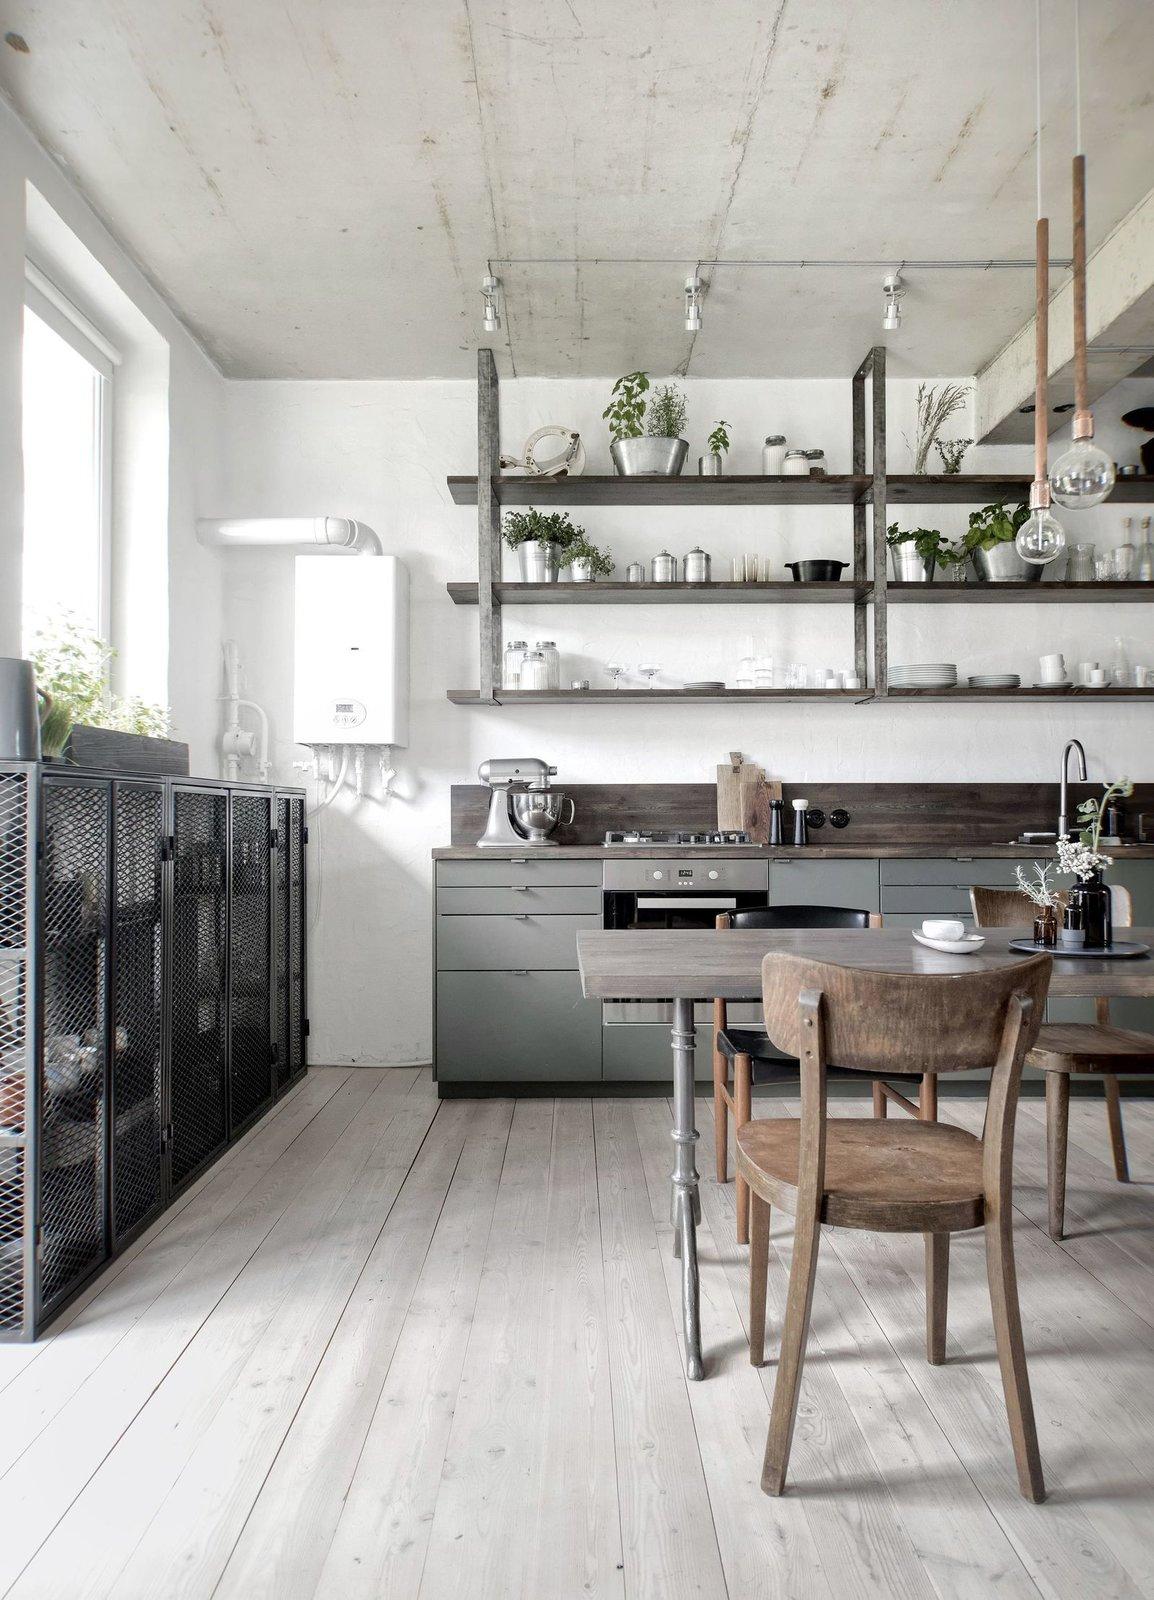 Kitchen, Wood, Wood, Ceiling, Range, Cooktops, Refrigerator, Light Hardwood, Drop In, and Colorful  Best Kitchen Light Hardwood Drop In Range Photos from Interior KAS